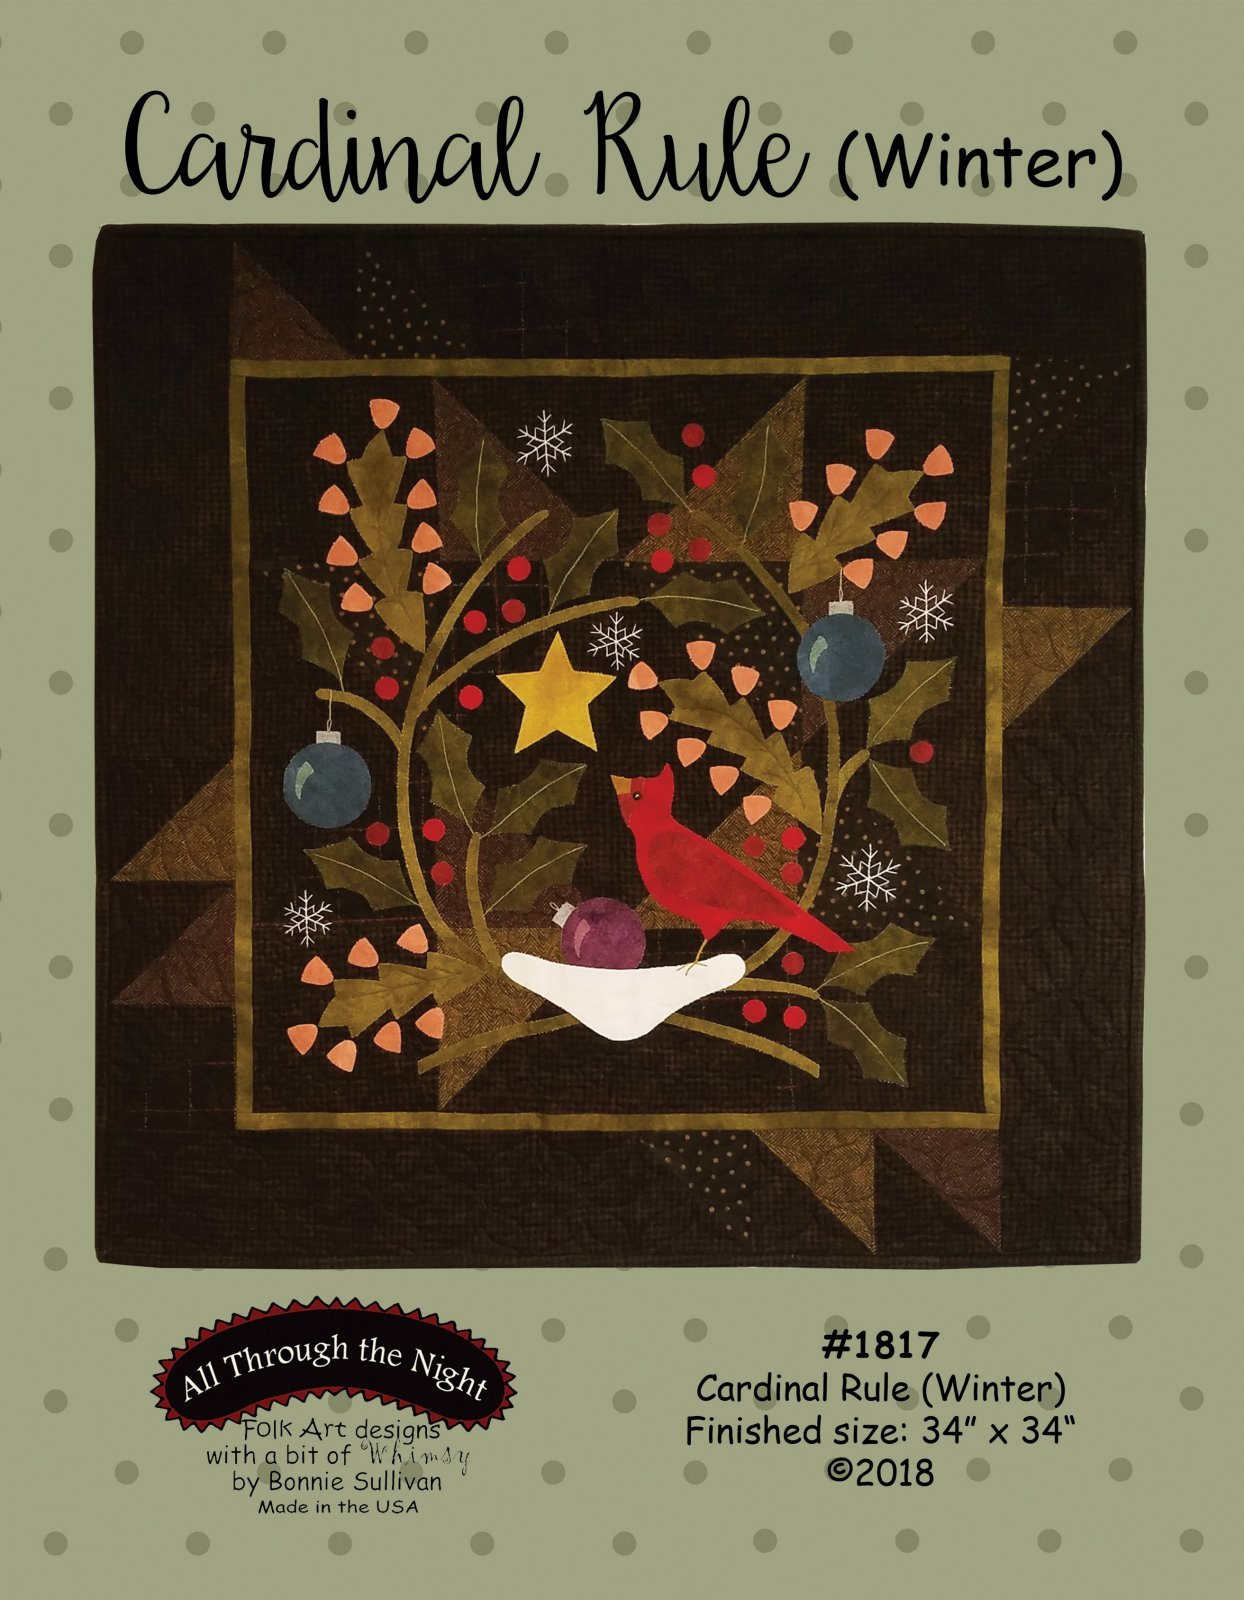 Cardinal Rule (Winter) Kit